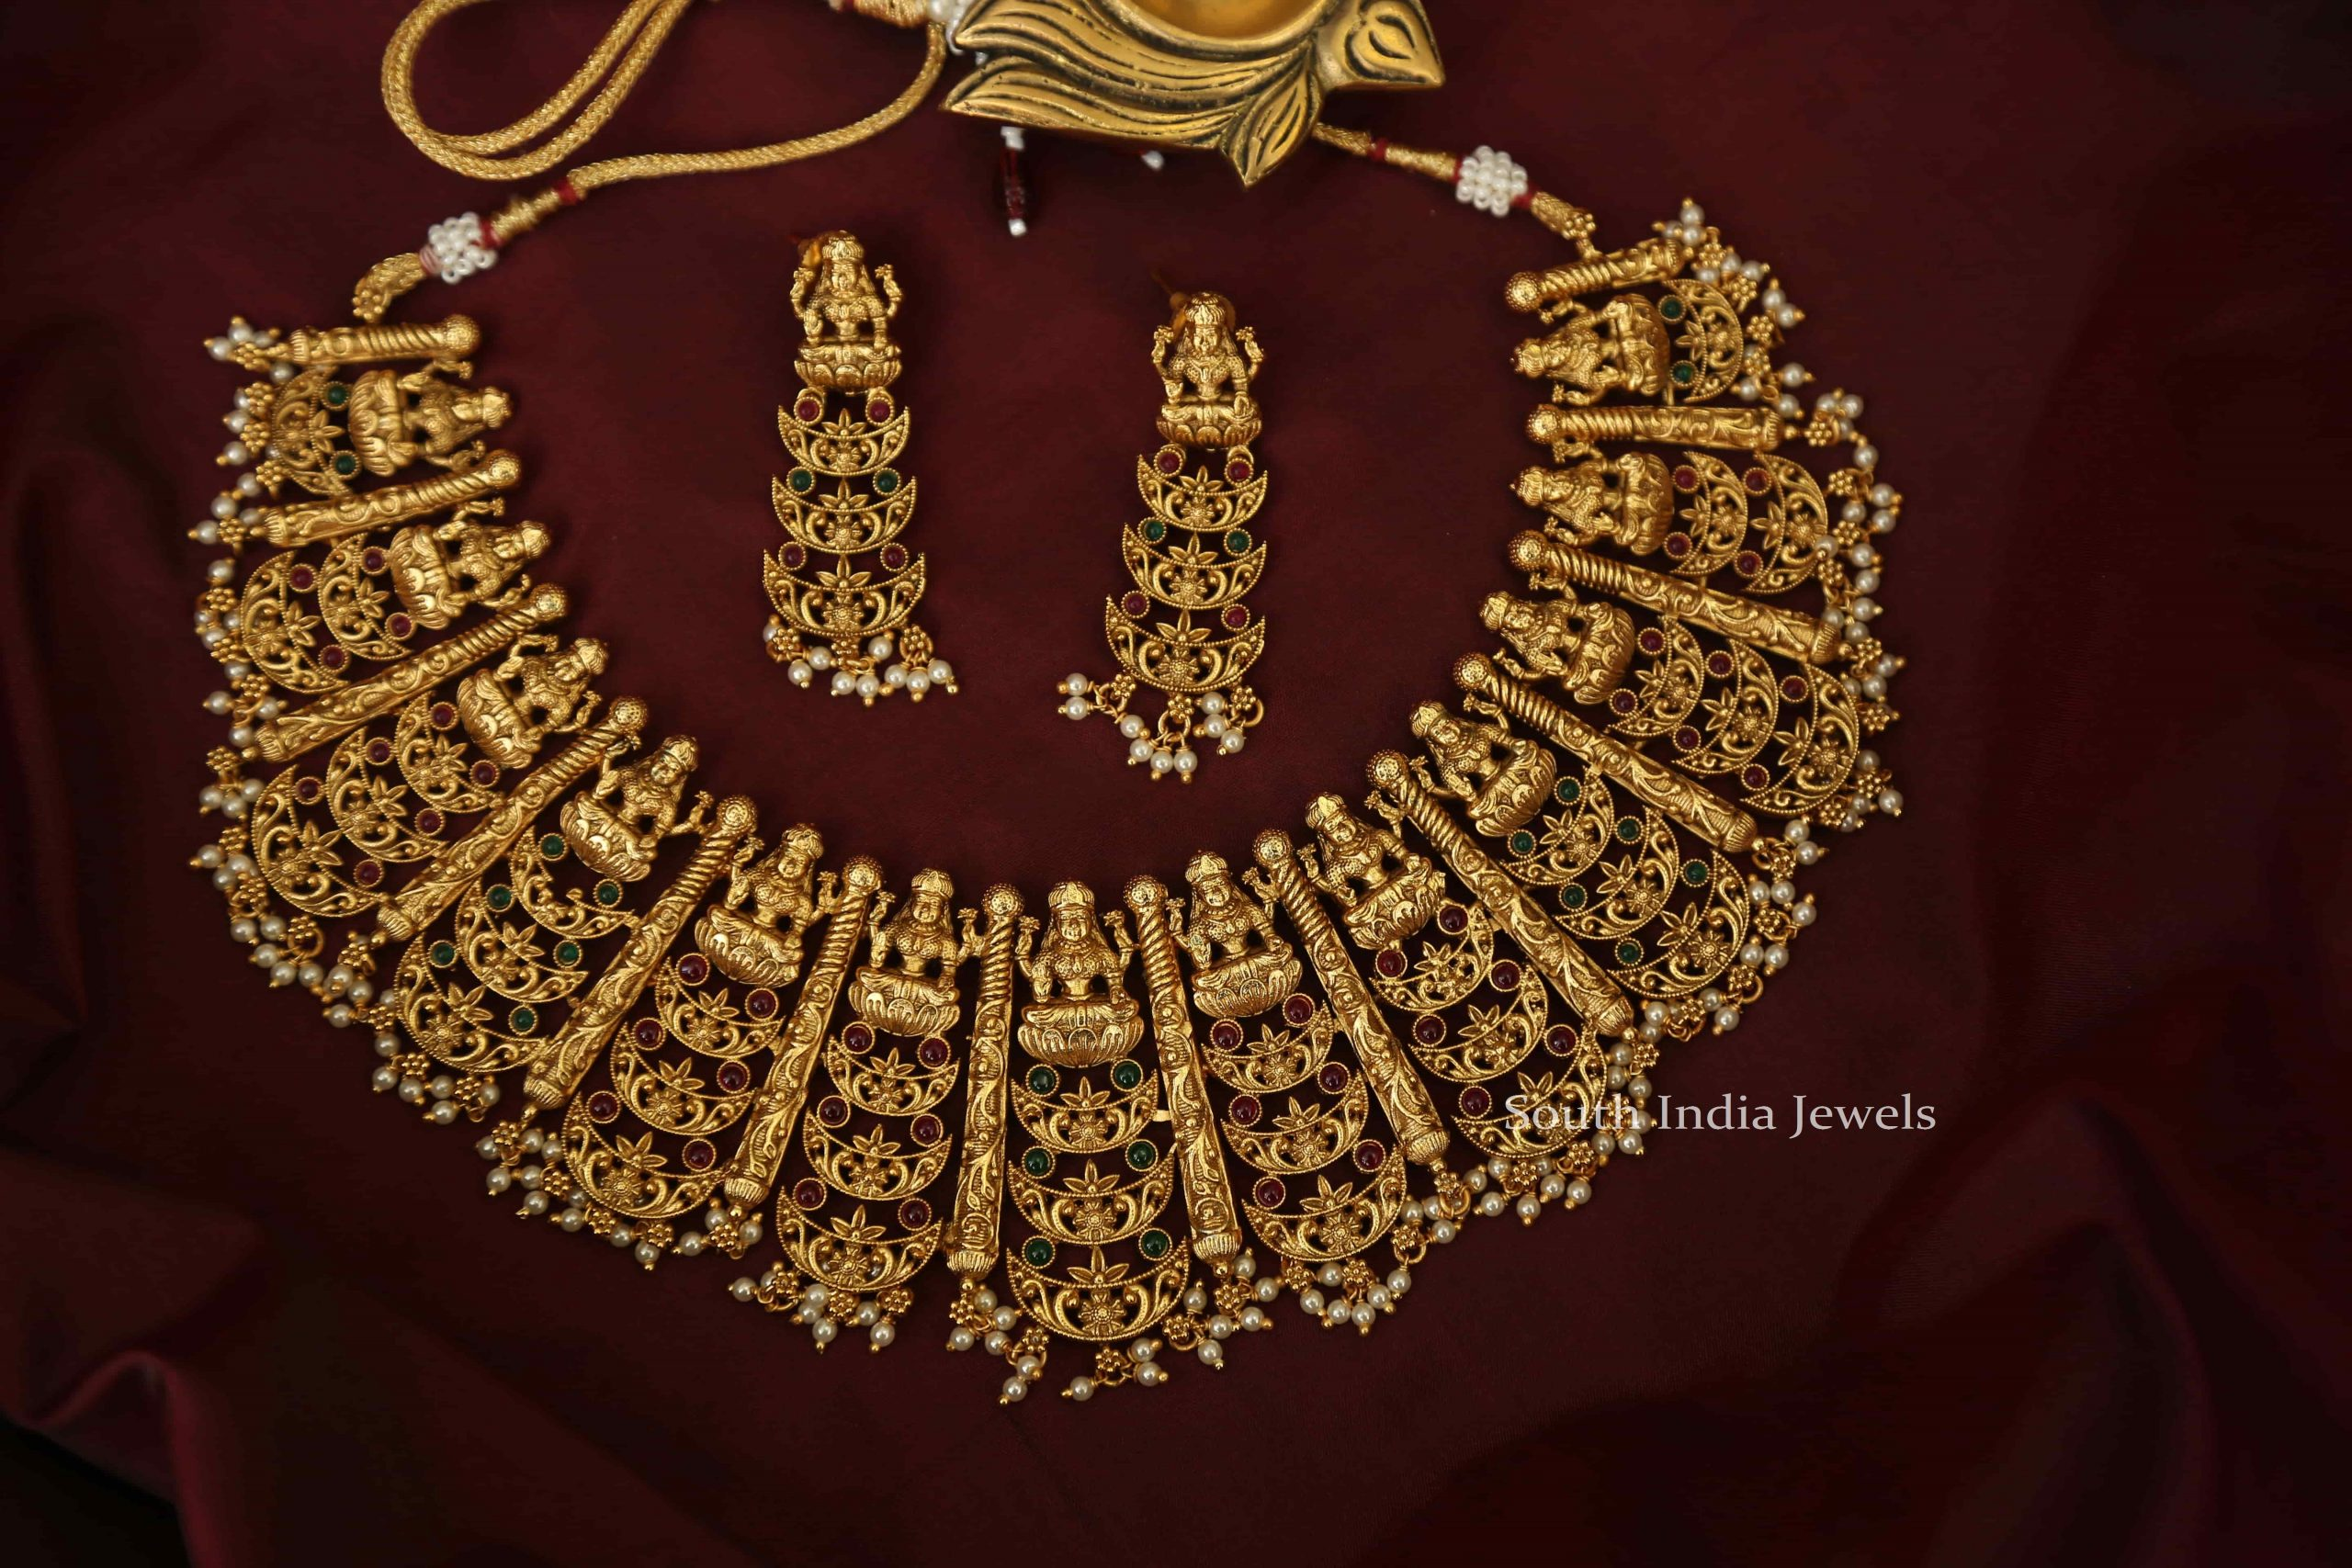 Grand-Bridal-Lakshmi-Multi-Layer-Necklace